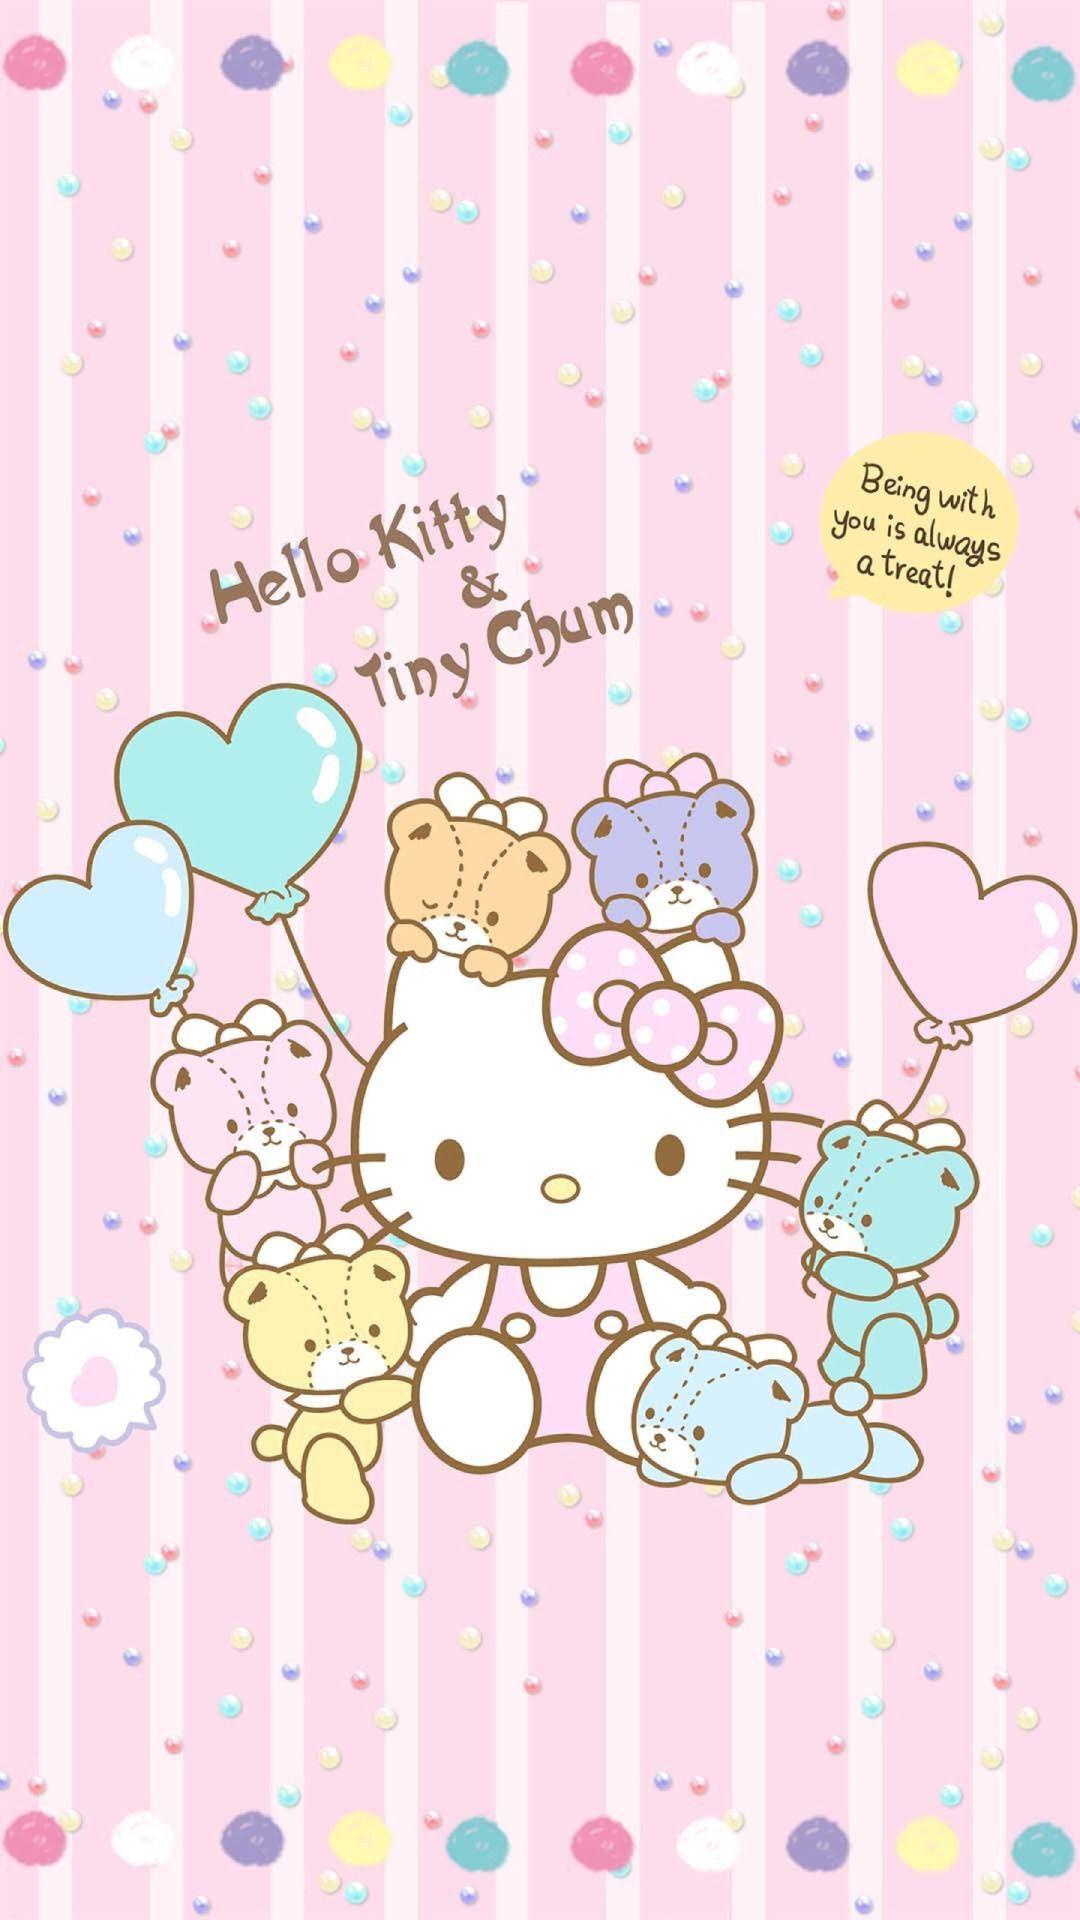 Hello kitty wallpaper wall paper hello kitty pinterest hello hello kitty wallpaper wall paper hello kitty pinterest hello kitty wallpaper kitty wallpaper and hello kitty voltagebd Image collections